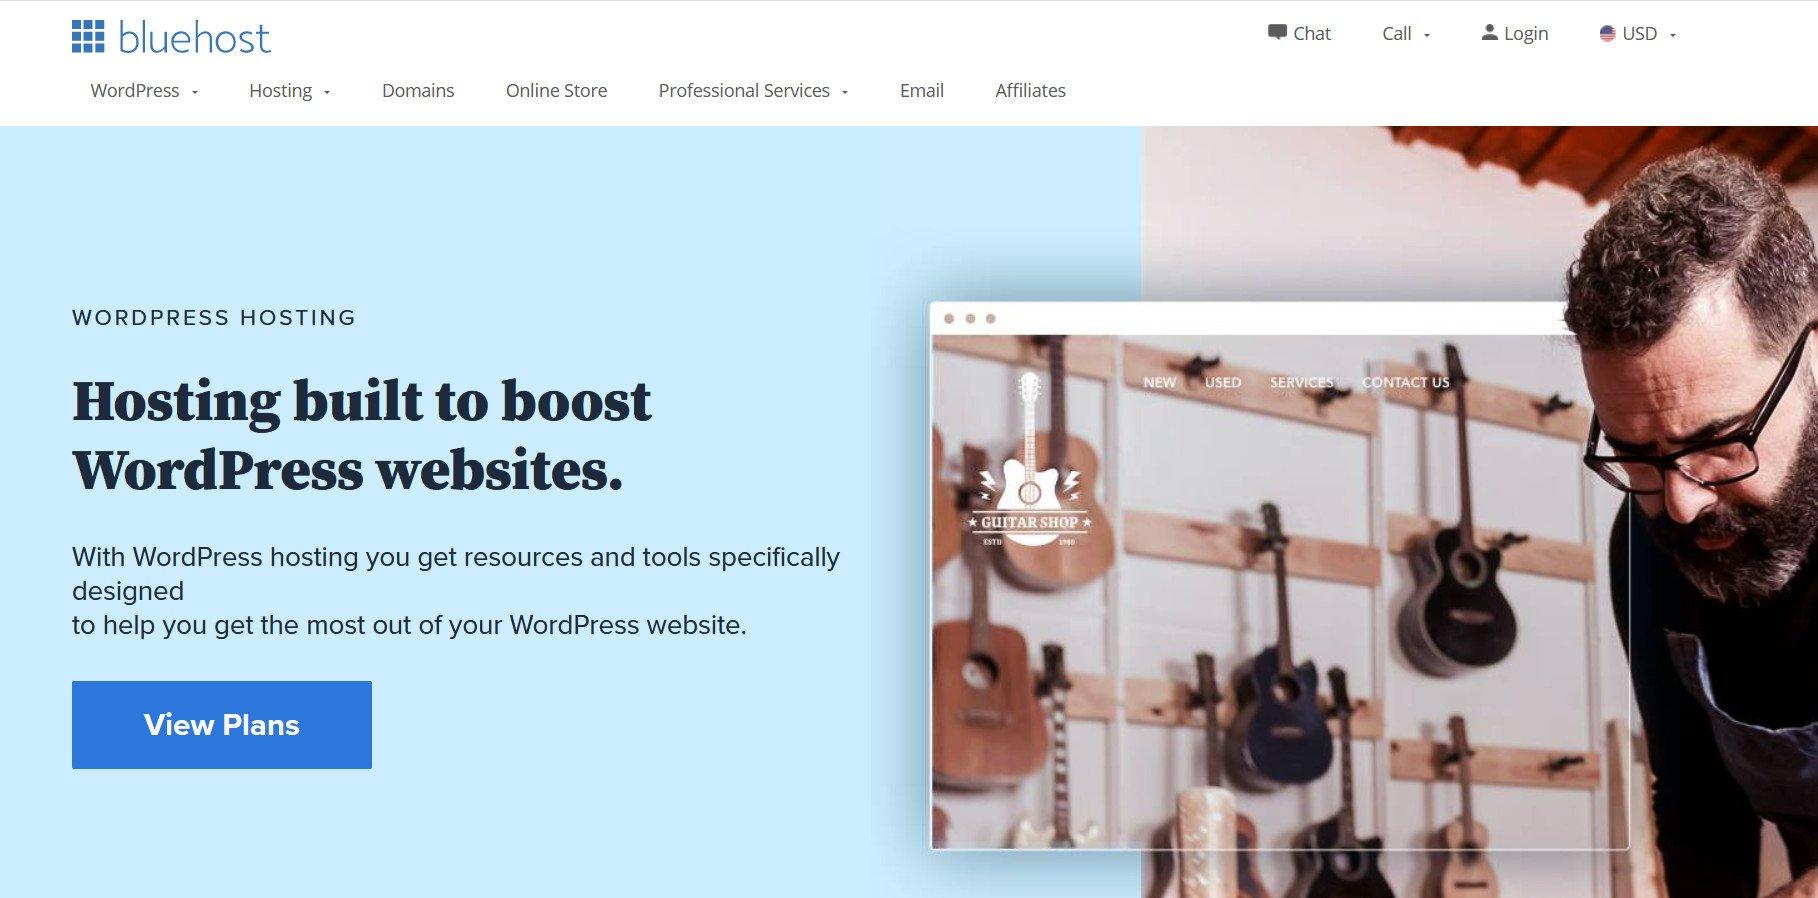 bh wordpress hosting